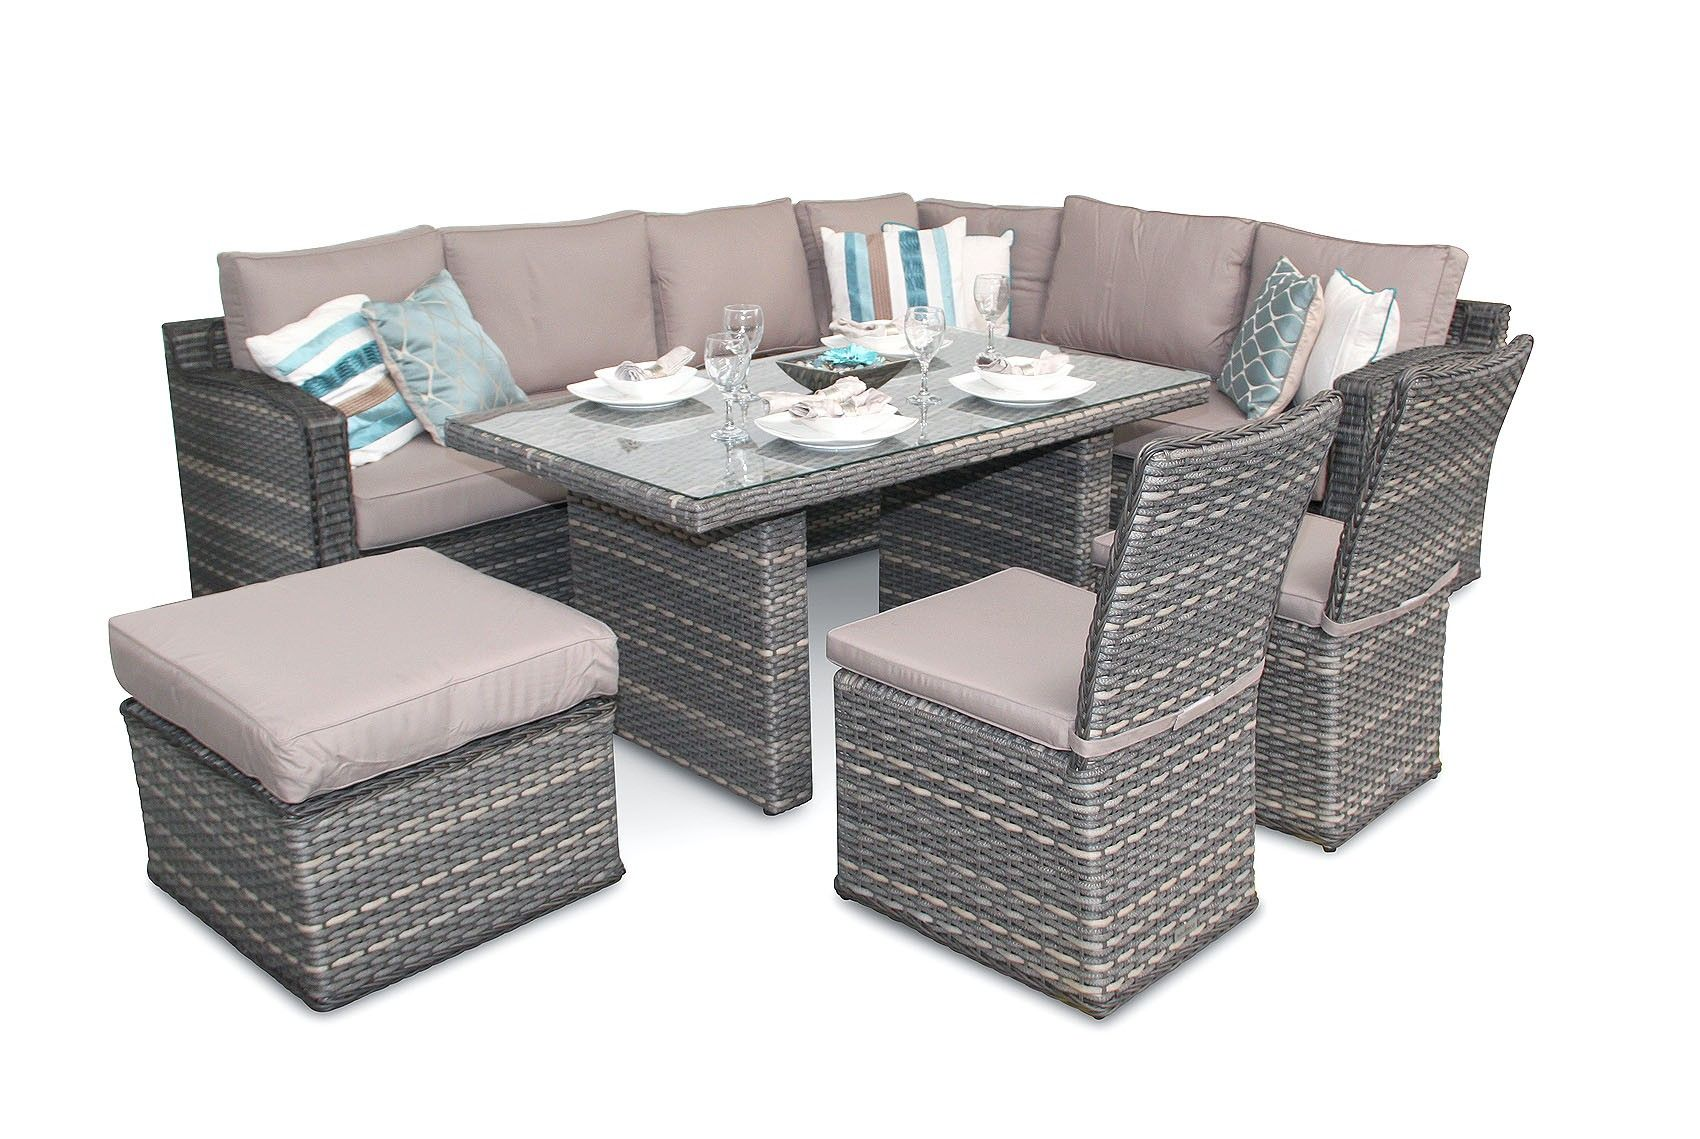 Rattan Garden Furniture L Shape luxury rattan garden corner dining set - impressive design